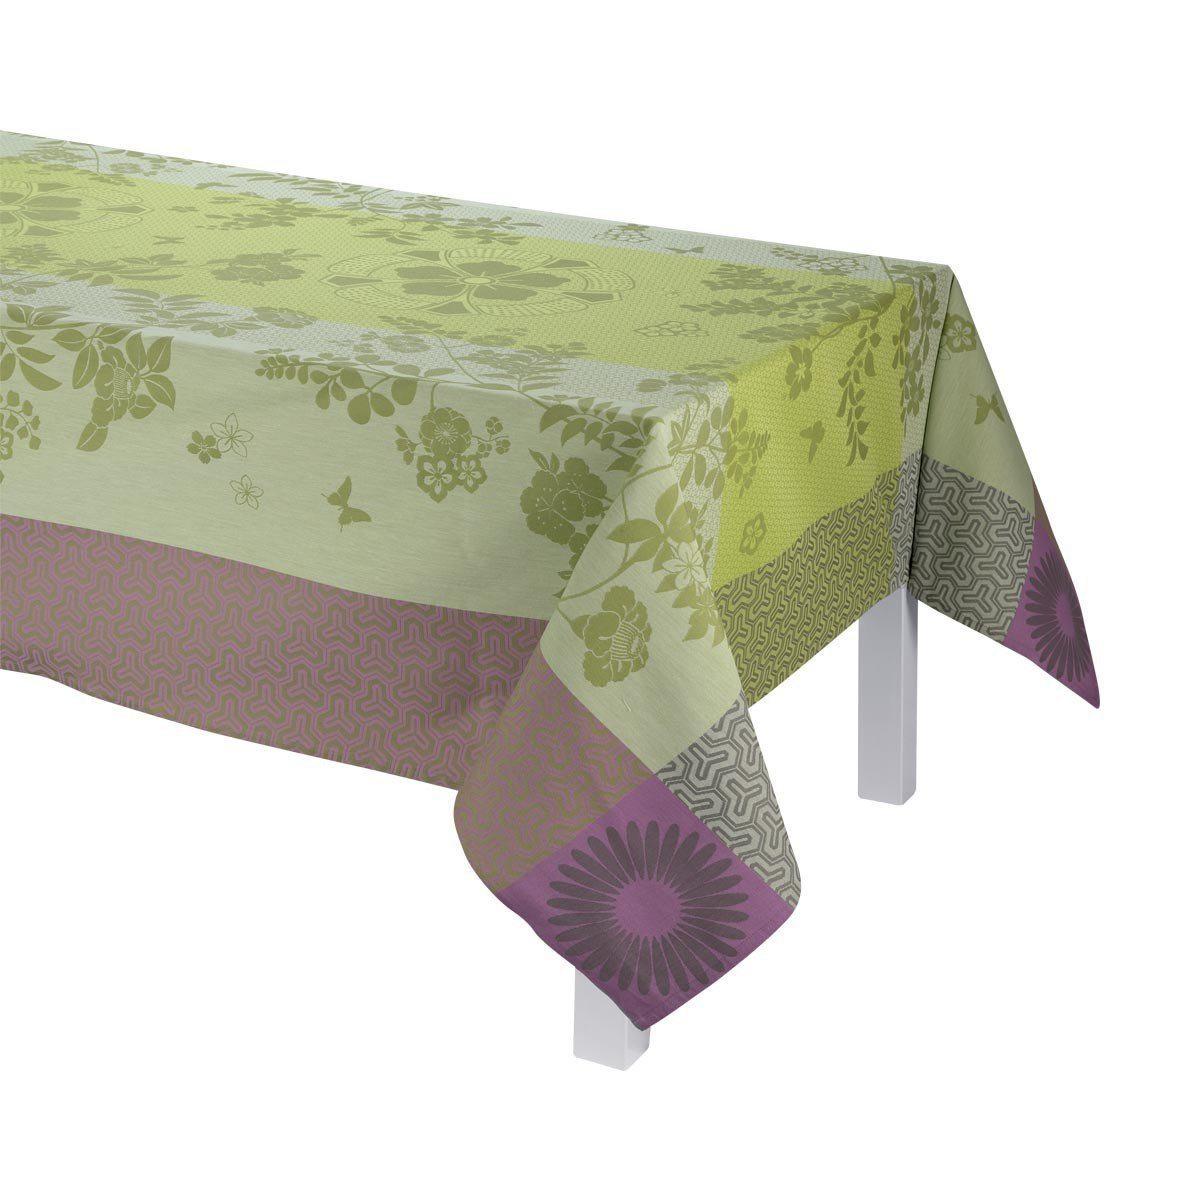 Asia Mood Table Linen By Le Jacquard Francais Table Linens Home